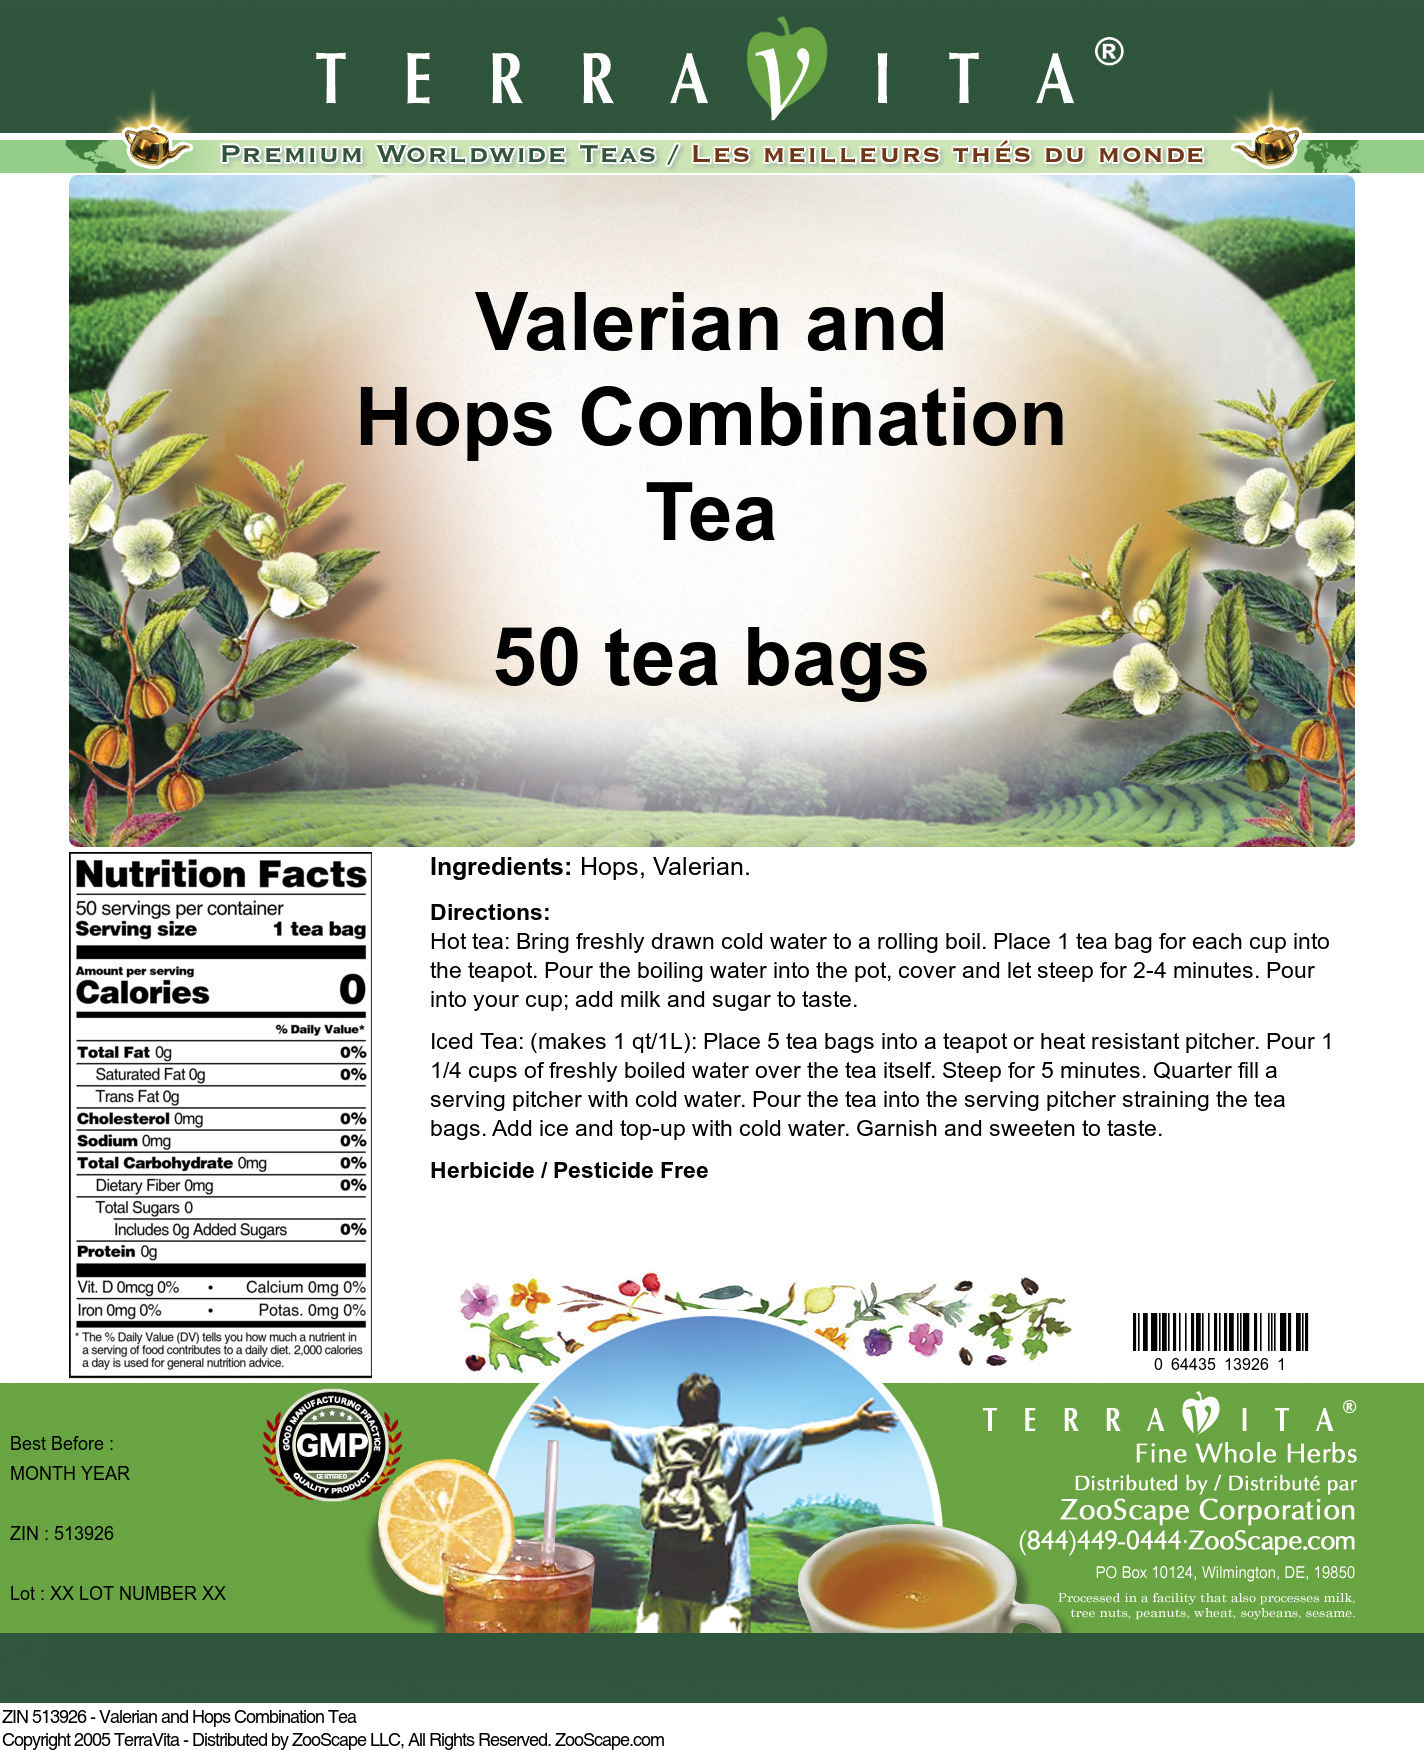 Valerian and Hops Combination Tea